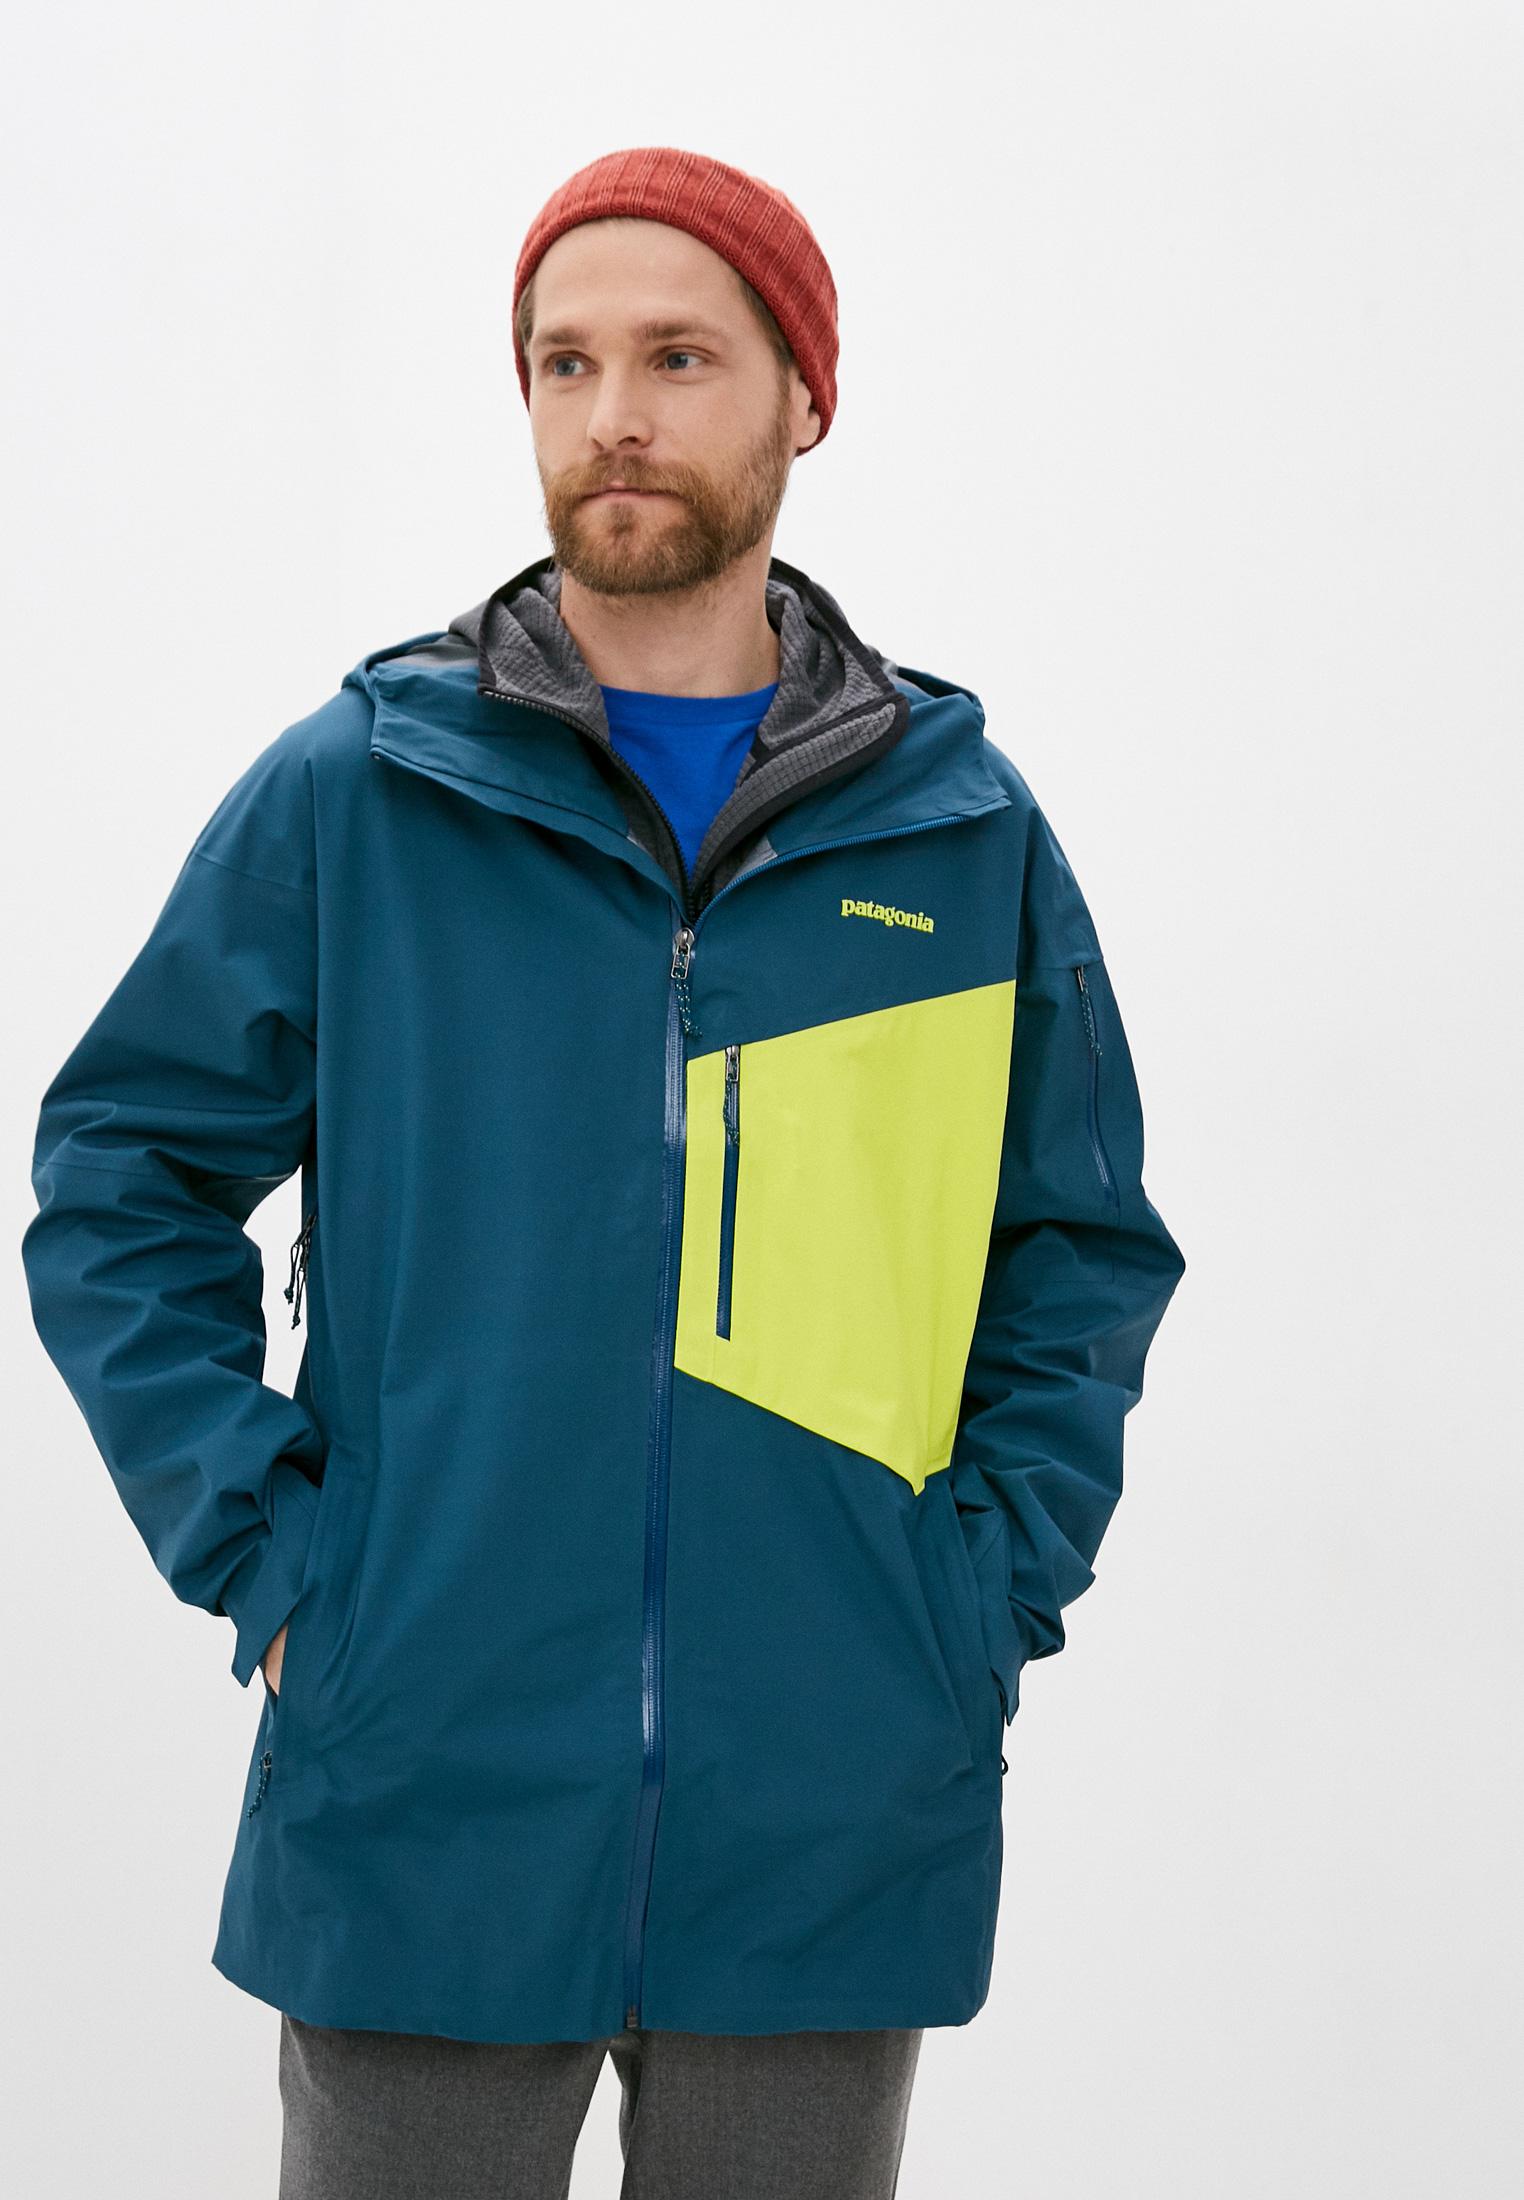 Мужская верхняя одежда Patagonia 30065